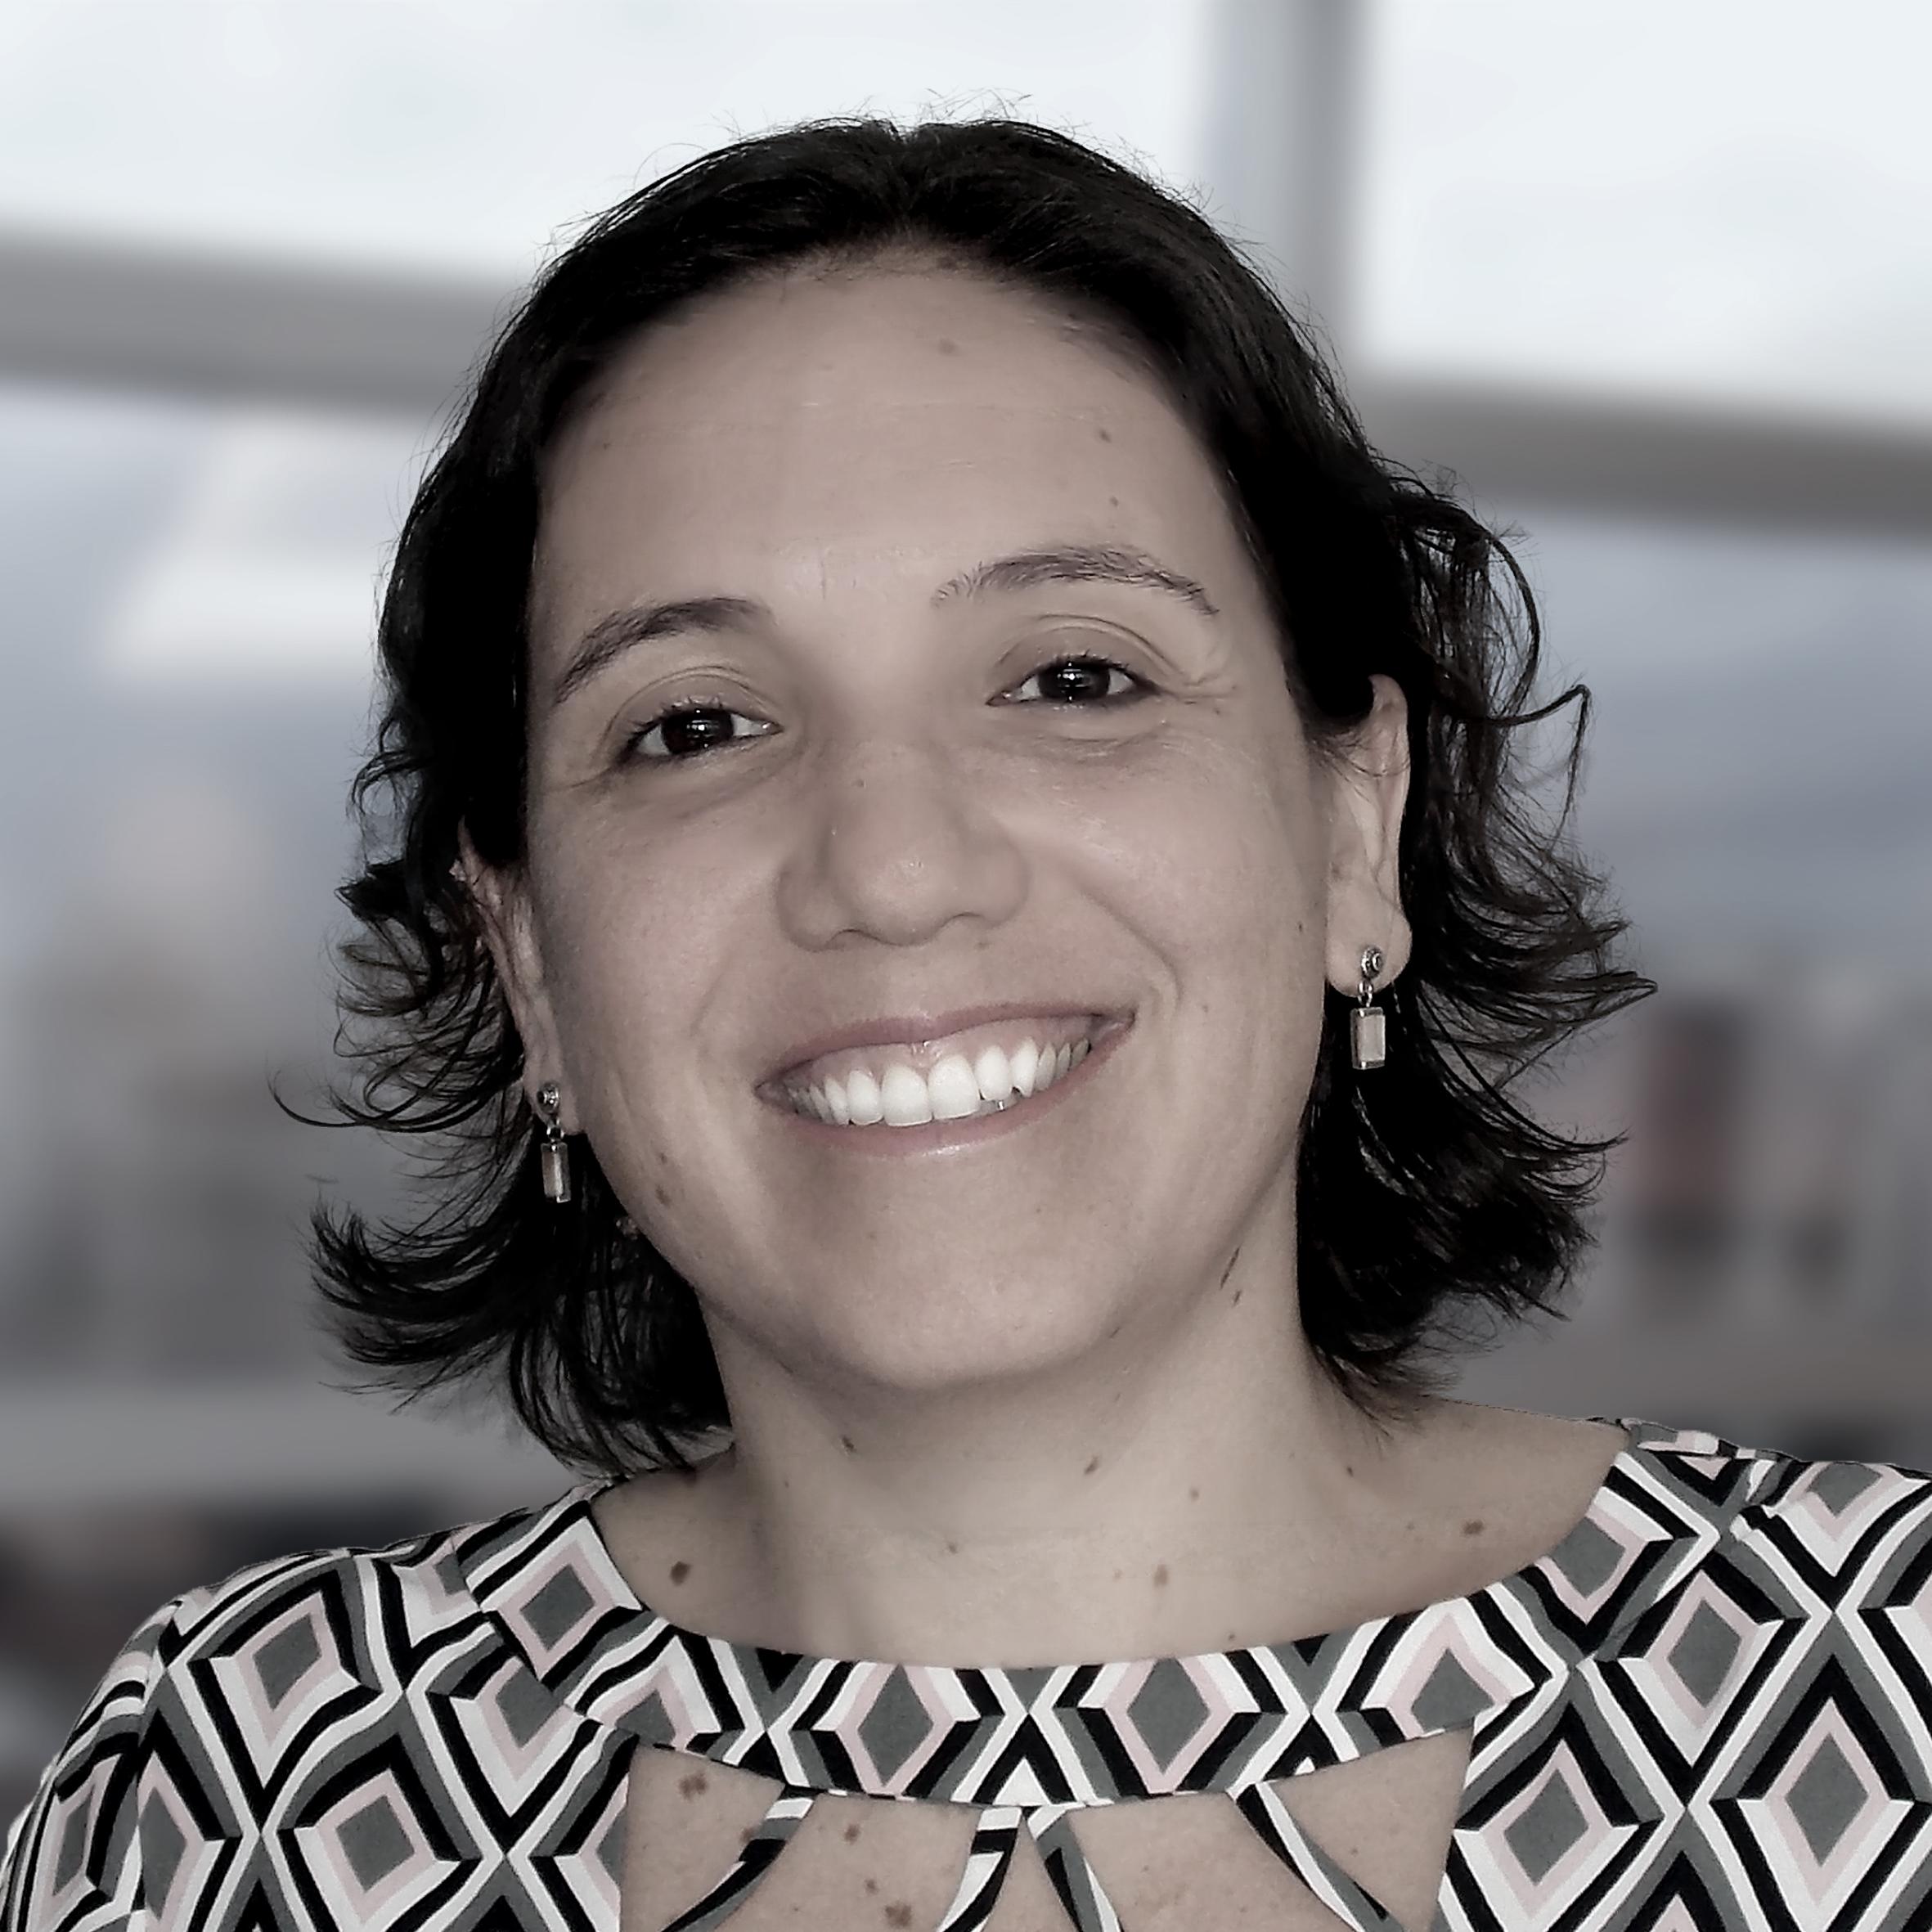 Mariana Zaparolli Martins